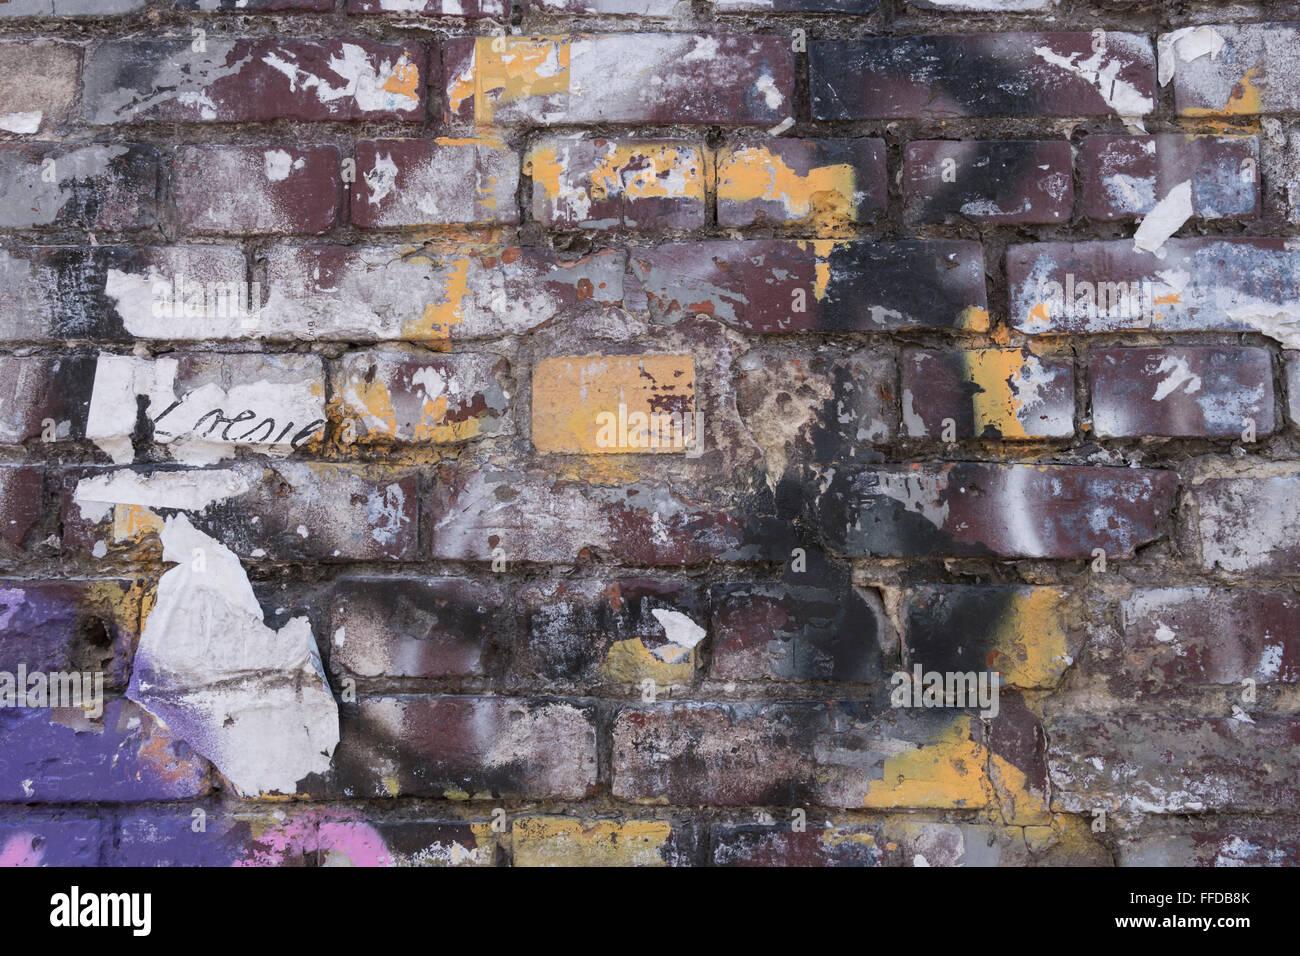 shabby wall in berlin friedrichshain - Stock Image